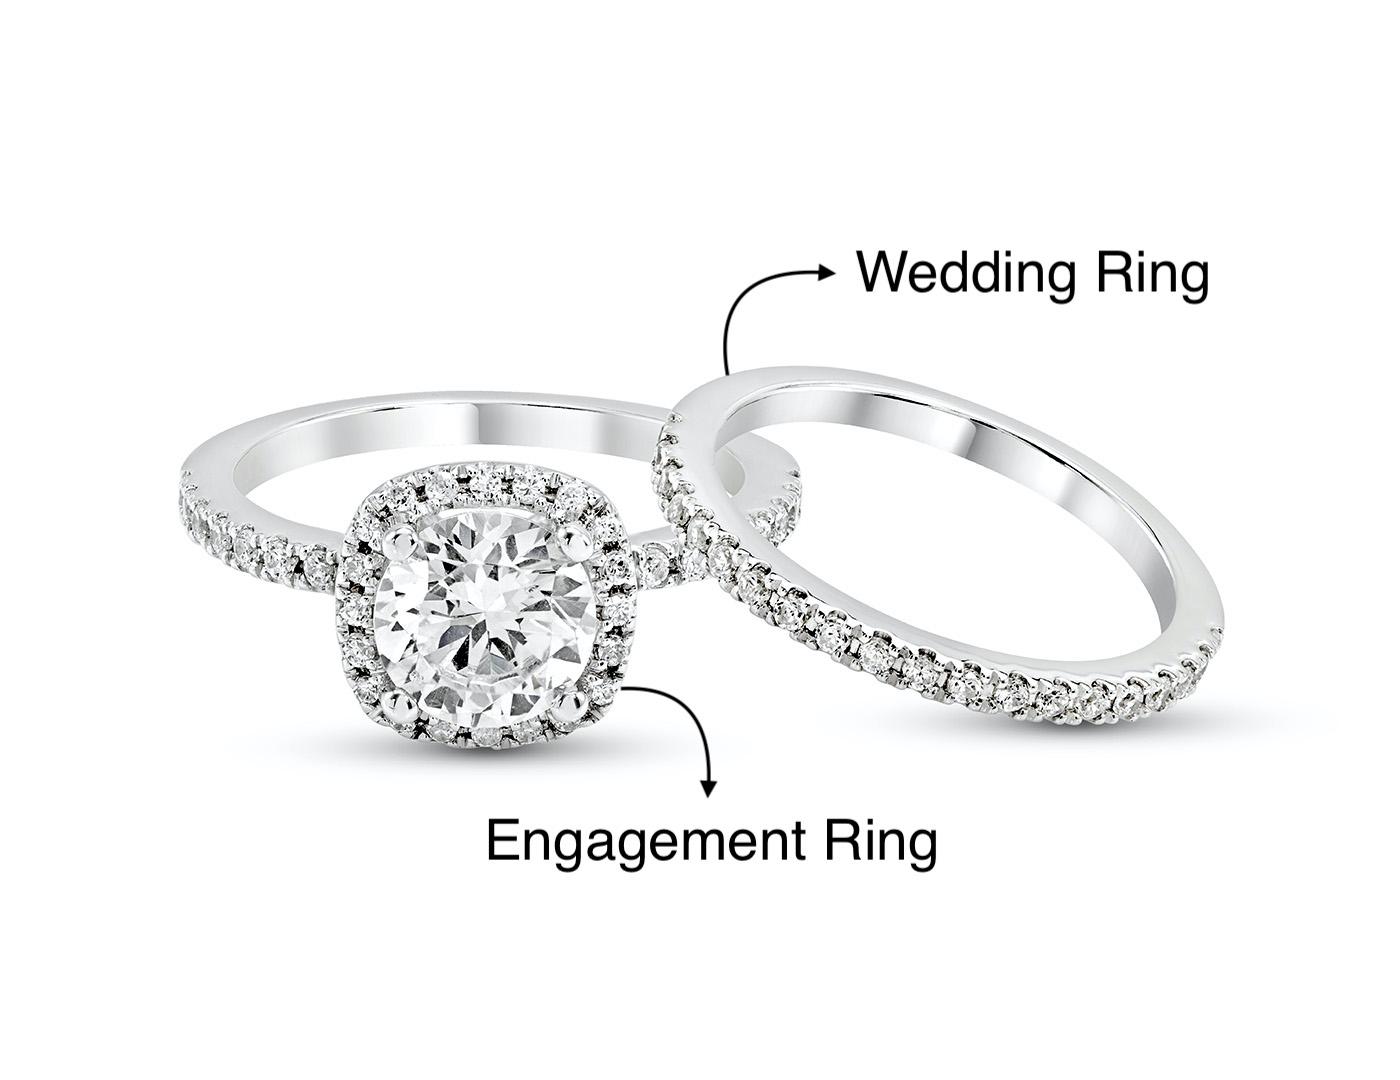 Download Wedding Ring Vs Wedding Band Images Wedding